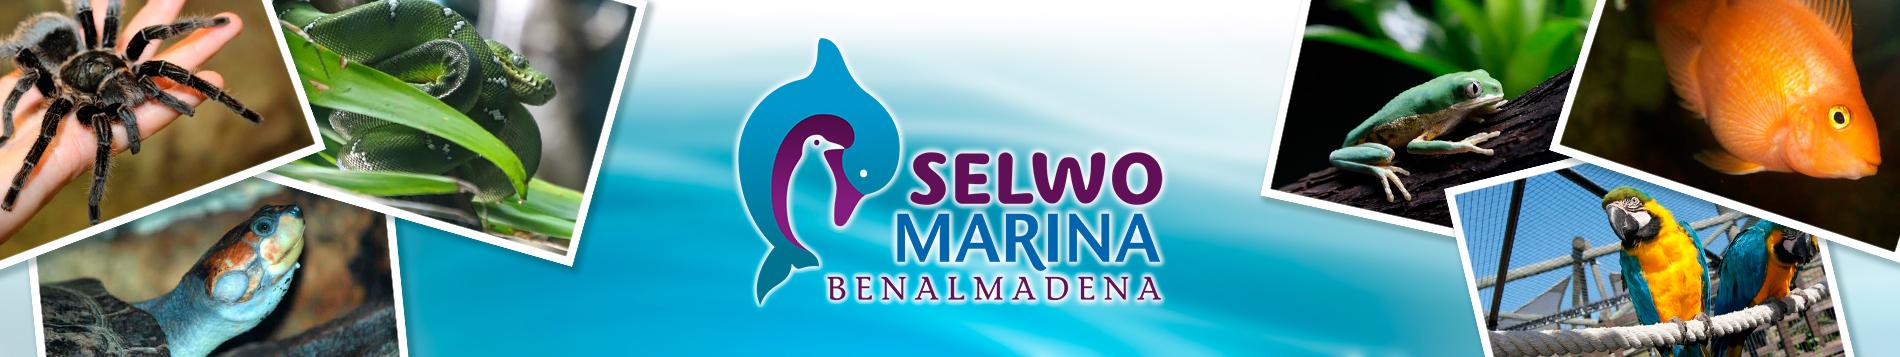 Selwo Marina en Benalmádena